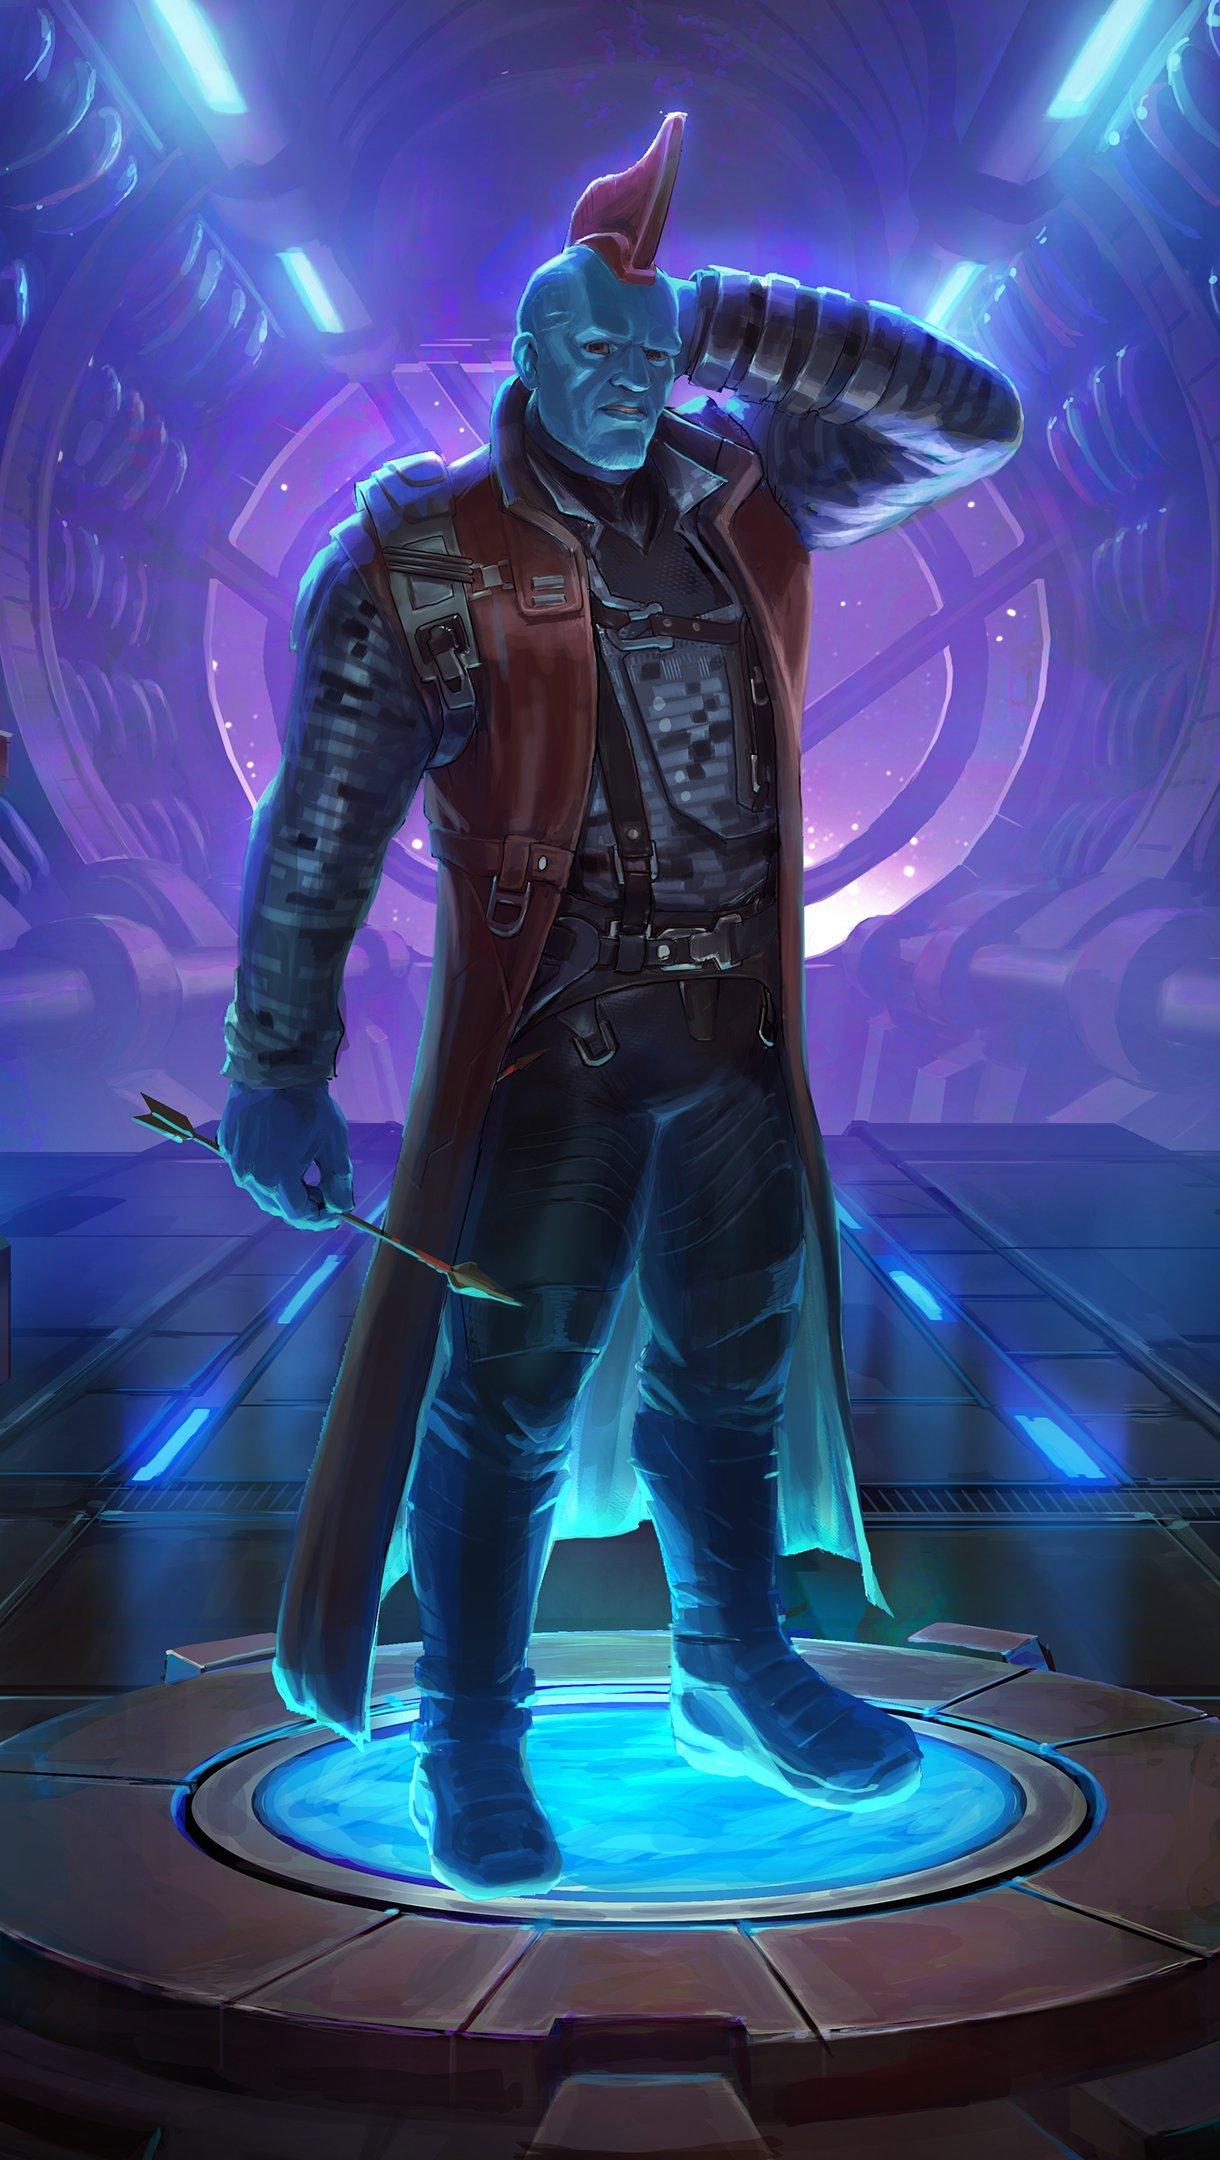 Wallpaper Yondu Marvel: Contest of Champions Vertical